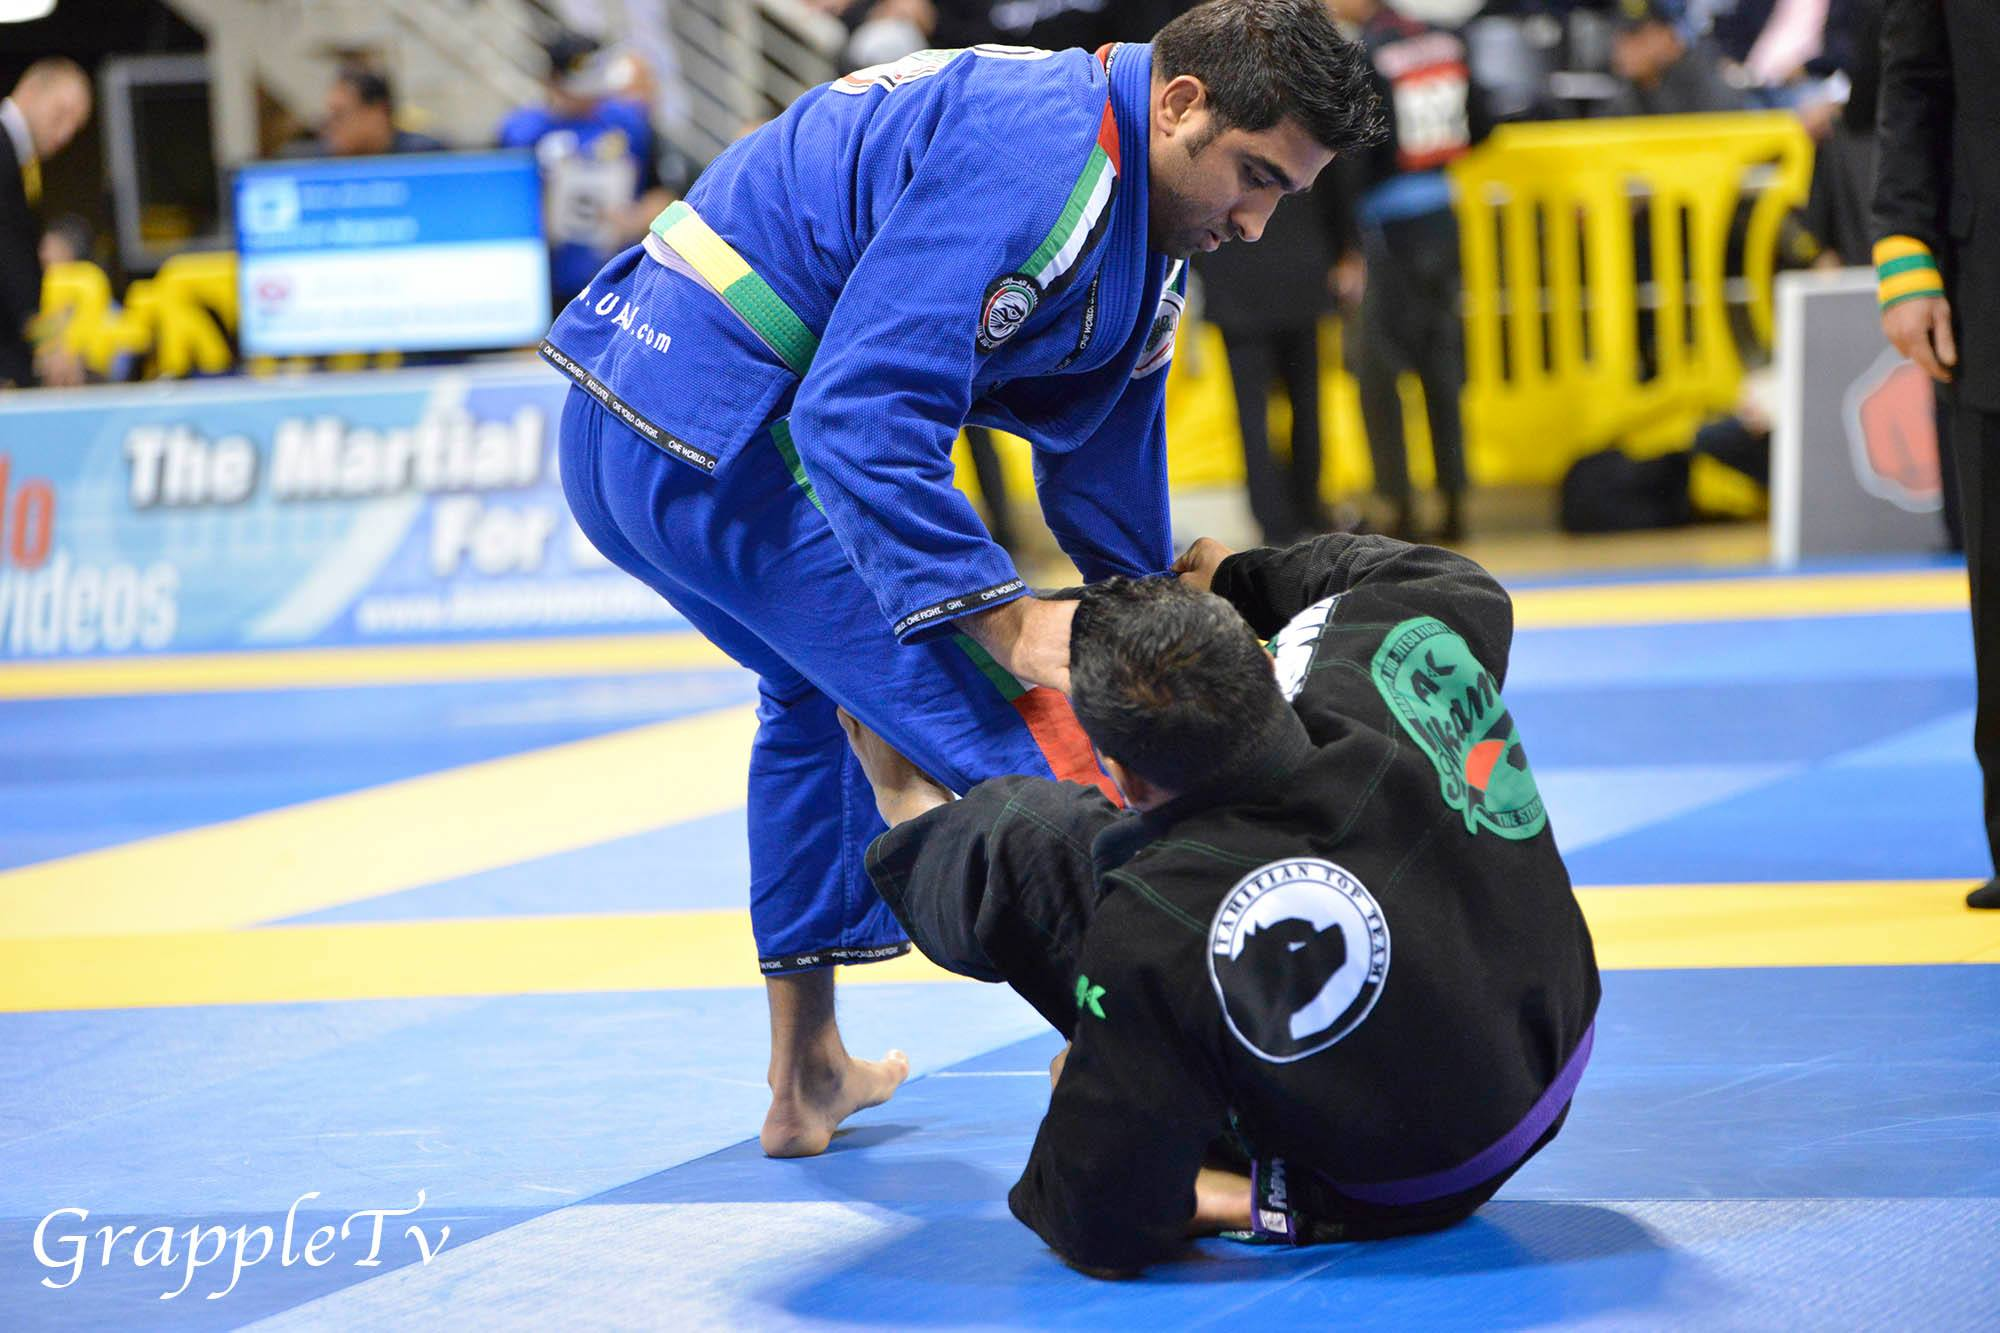 Jiu Jitsu – Dany Gérard et ses 'pitts bulls' de la TTT au Top du Jiu Jitsu mondial